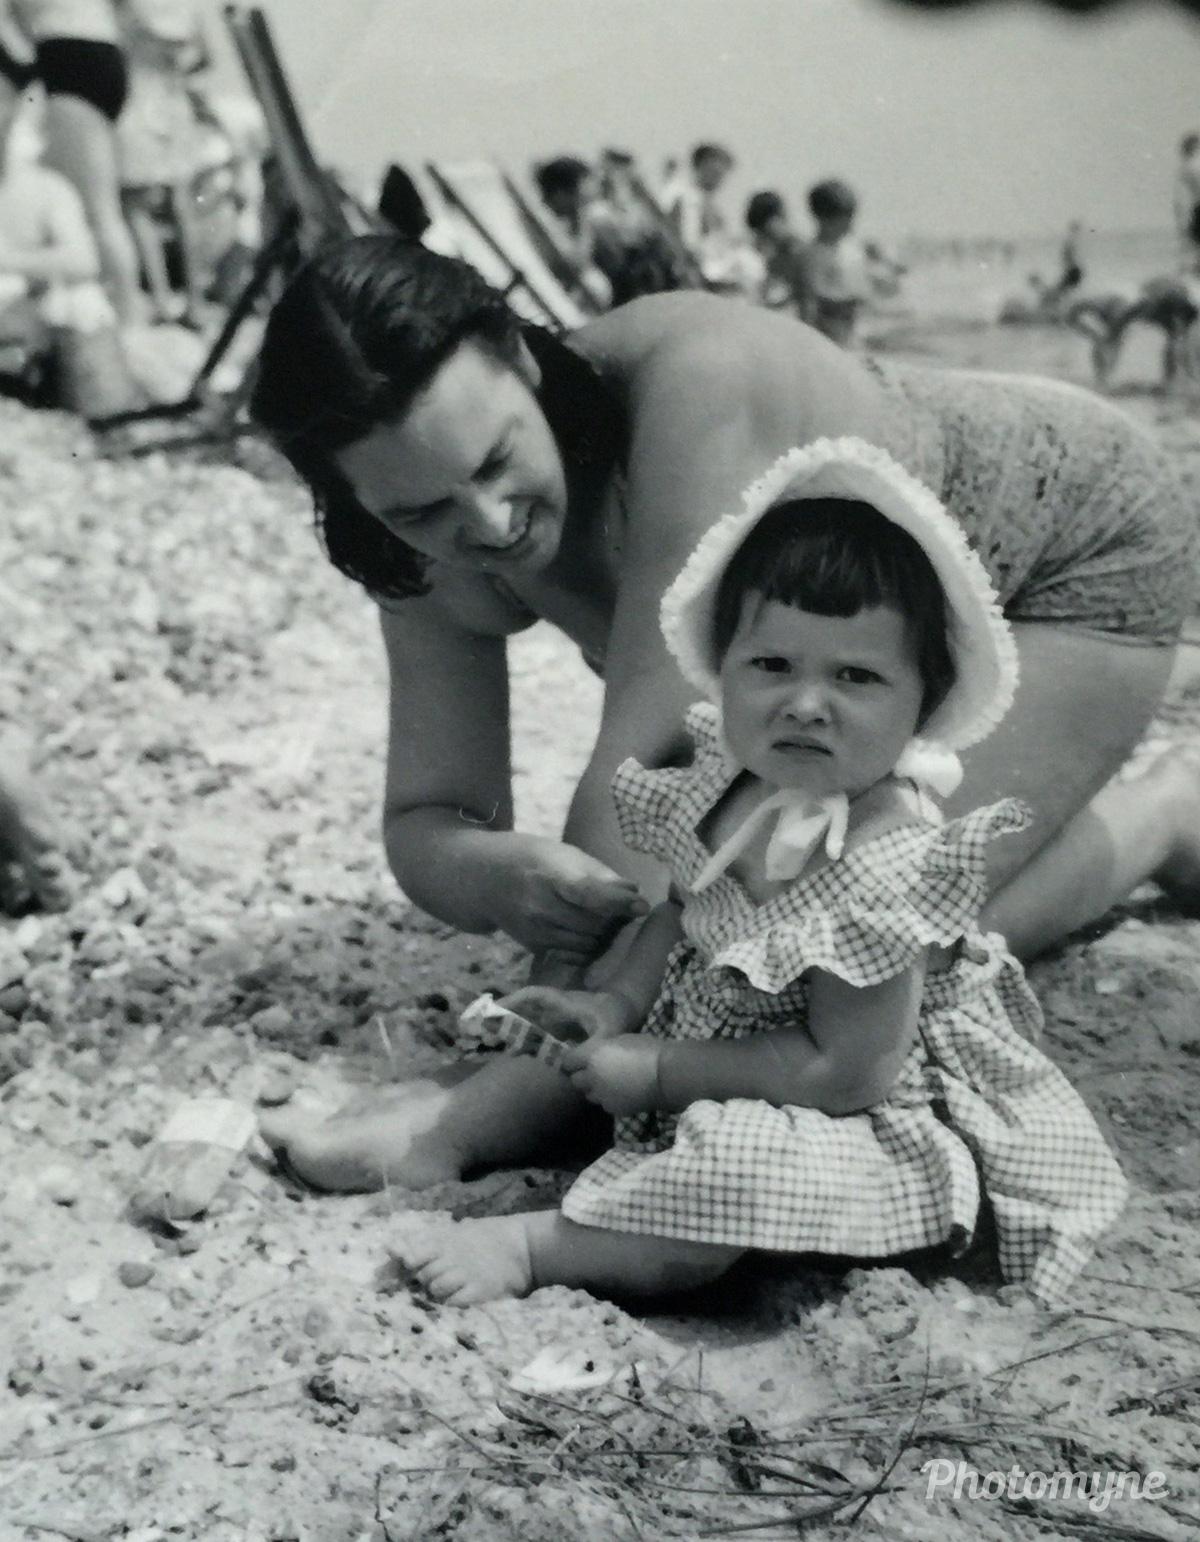 Not enjoying this beach! 1957, Ryde, Isle Of Wight, UK